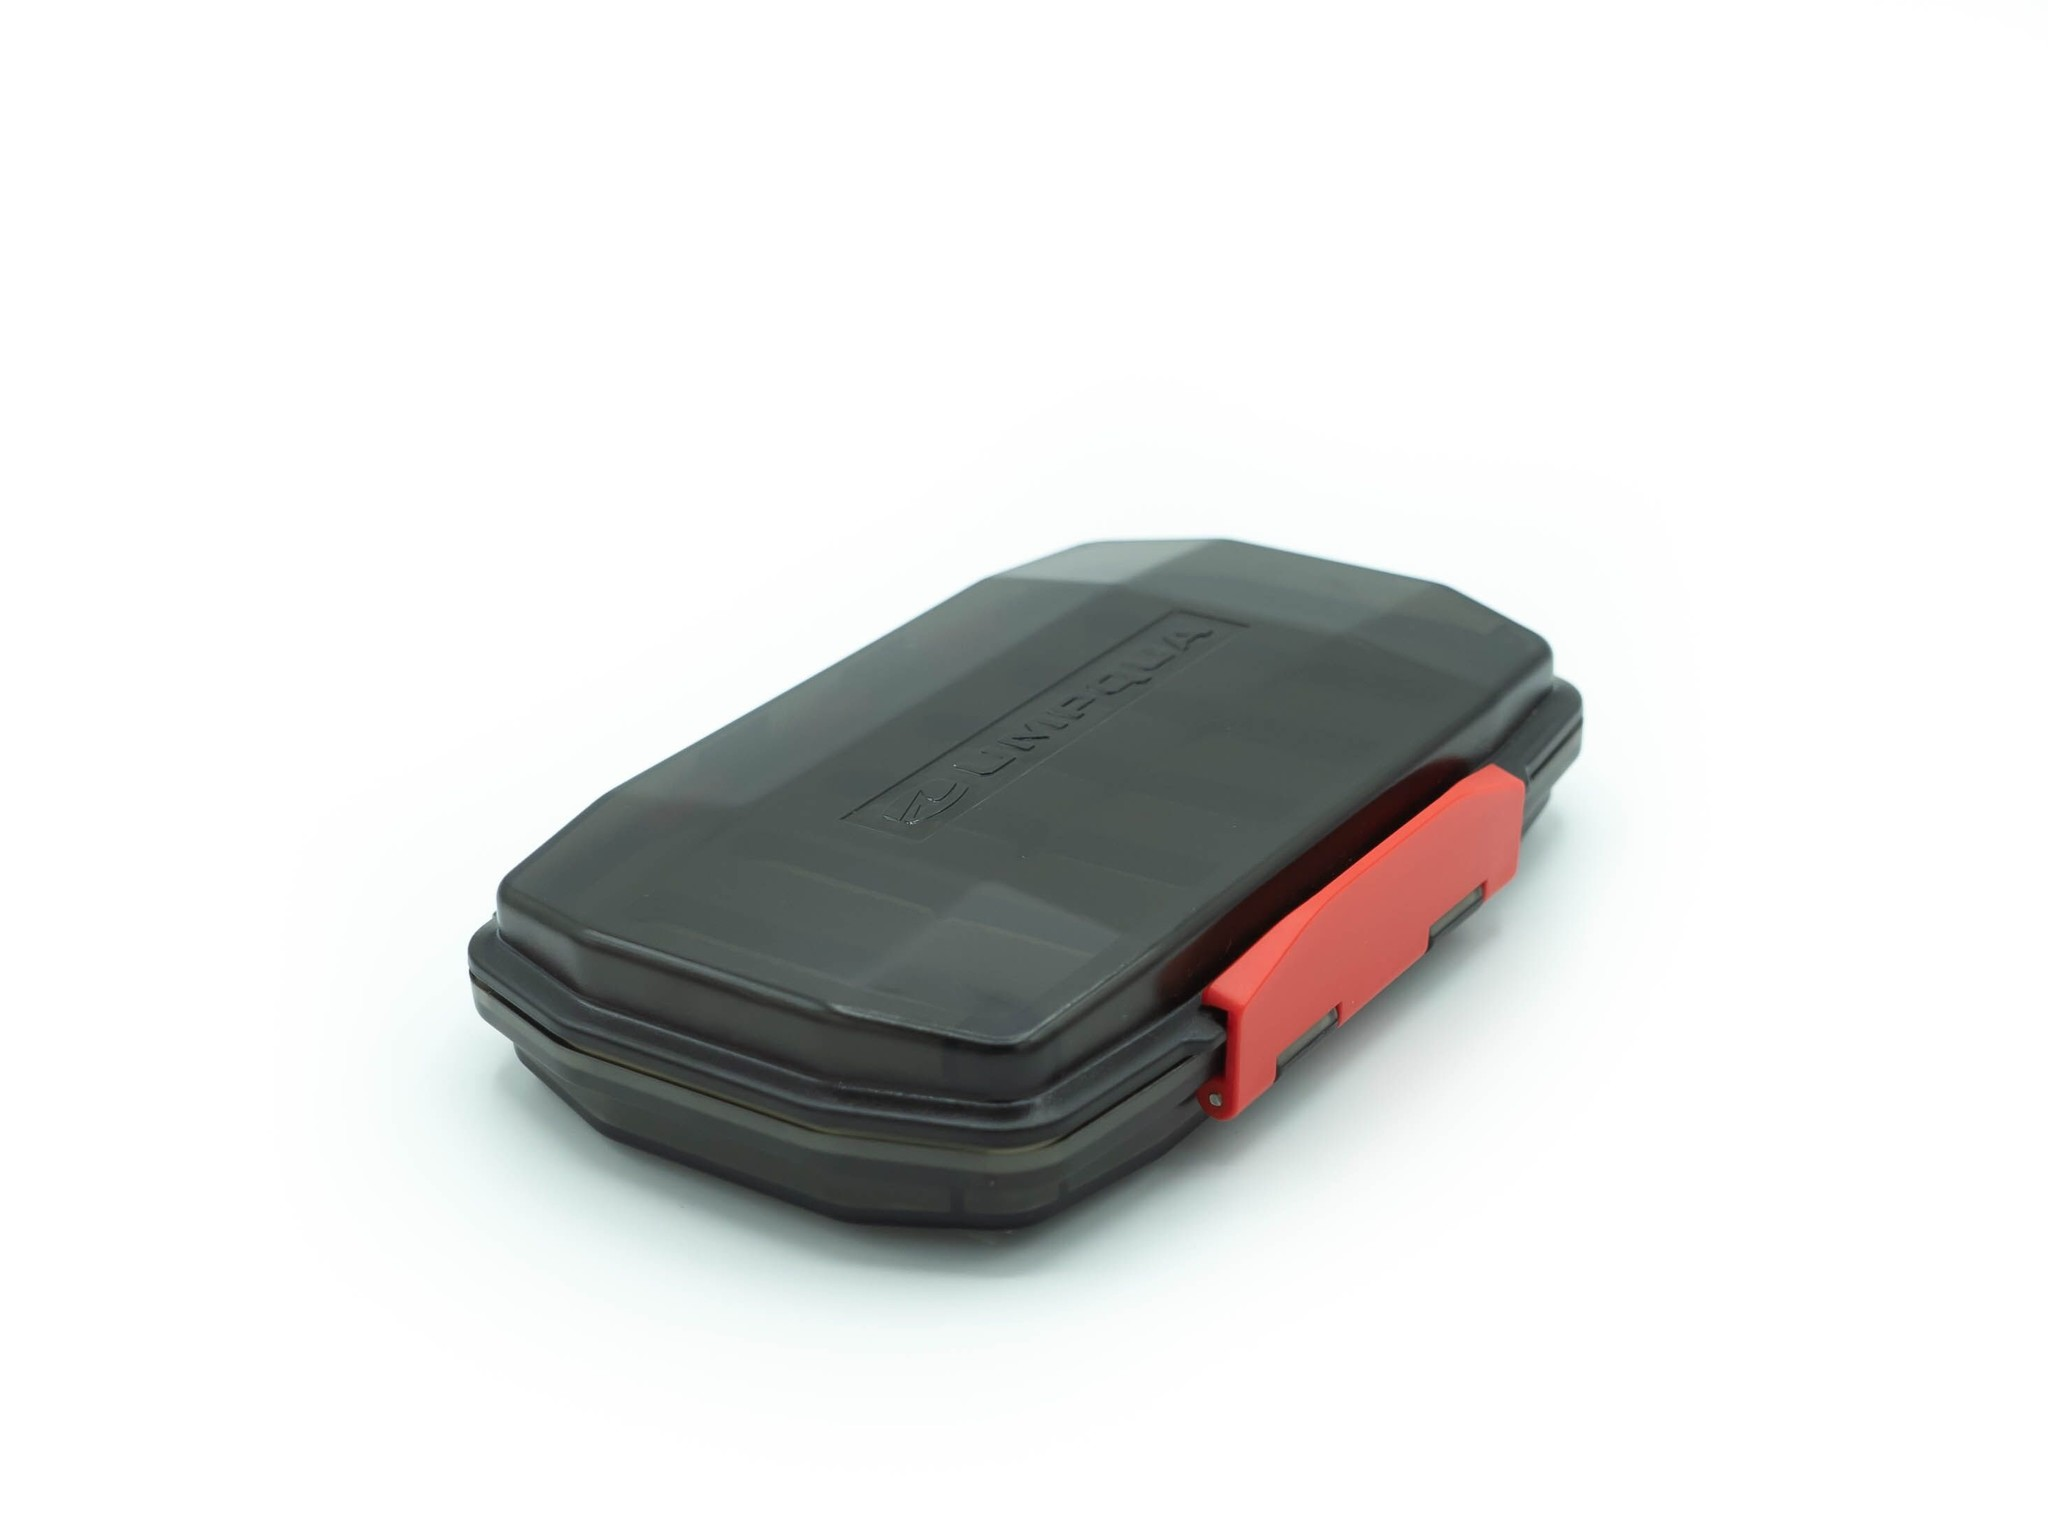 UMPQUA Umpqua UPG HD Standard Foam Fly Box - Red